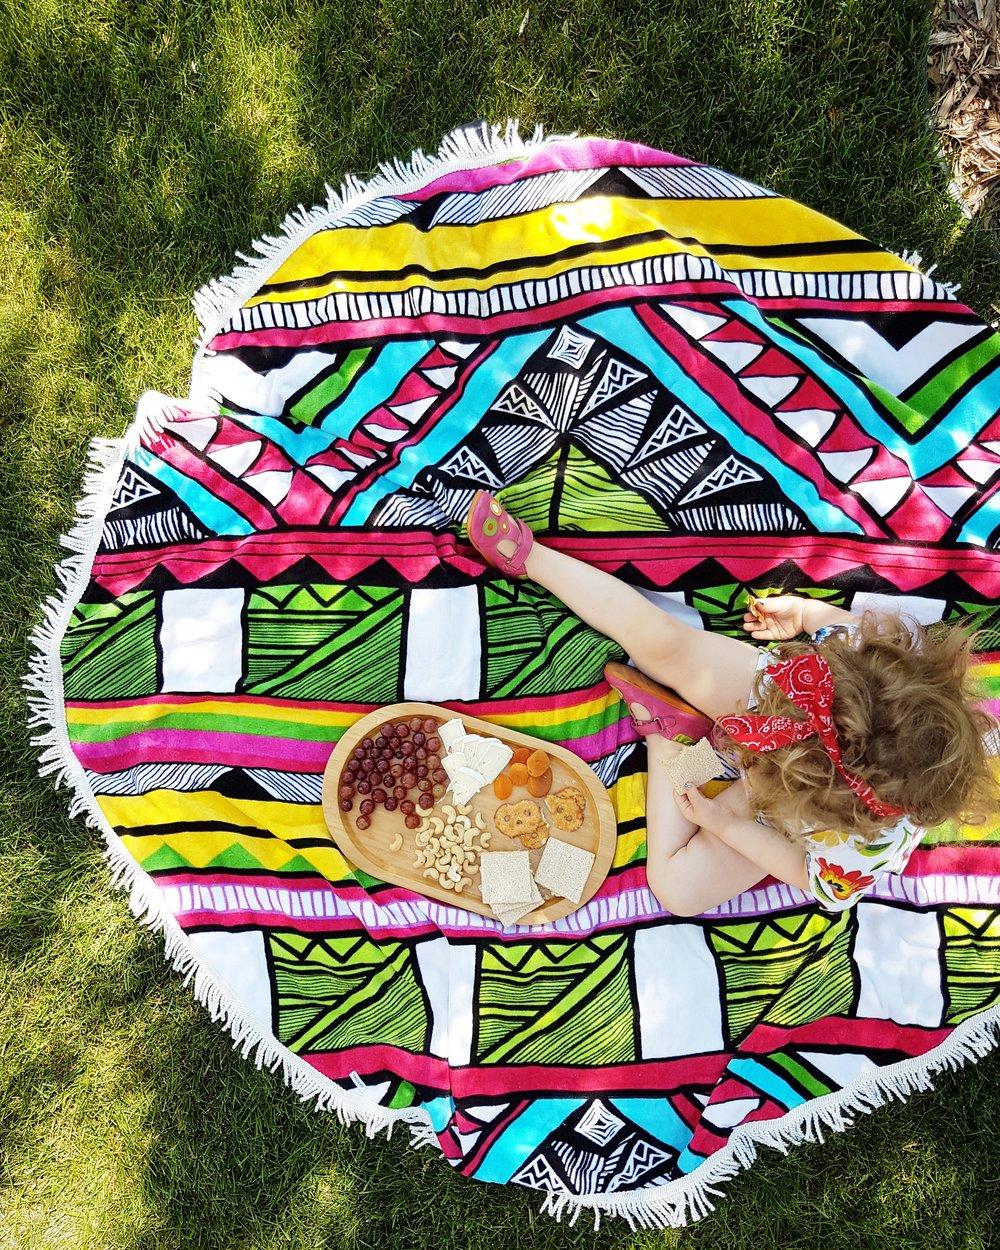 toddler picnic ideas.jpg